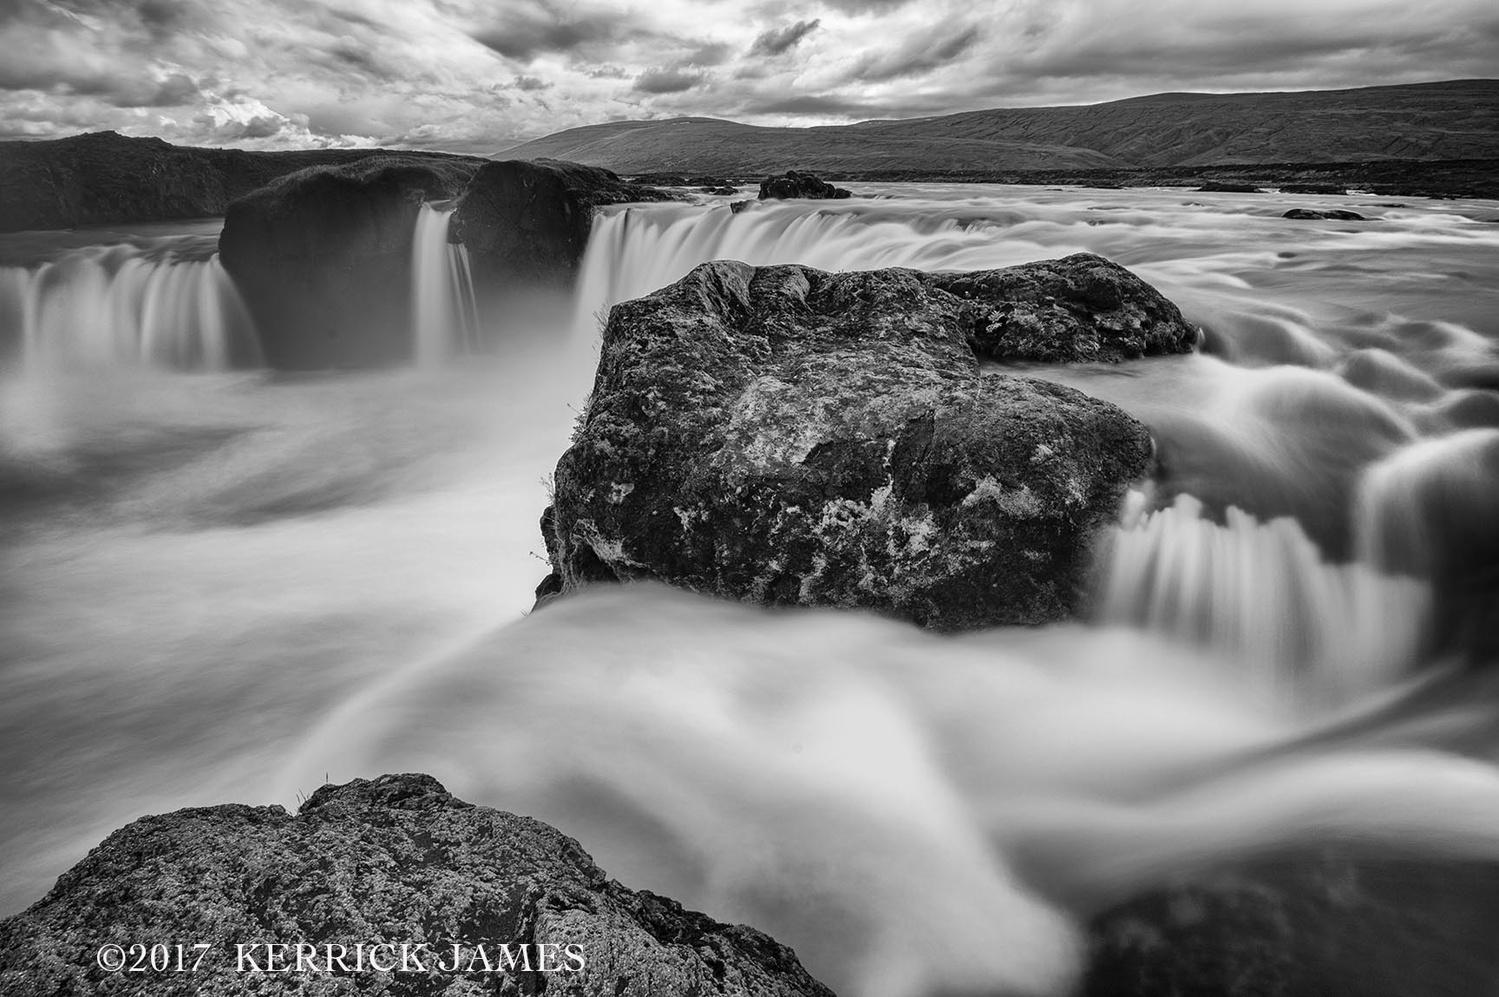 Godafoss waterfall, Iceland by Kerrick James